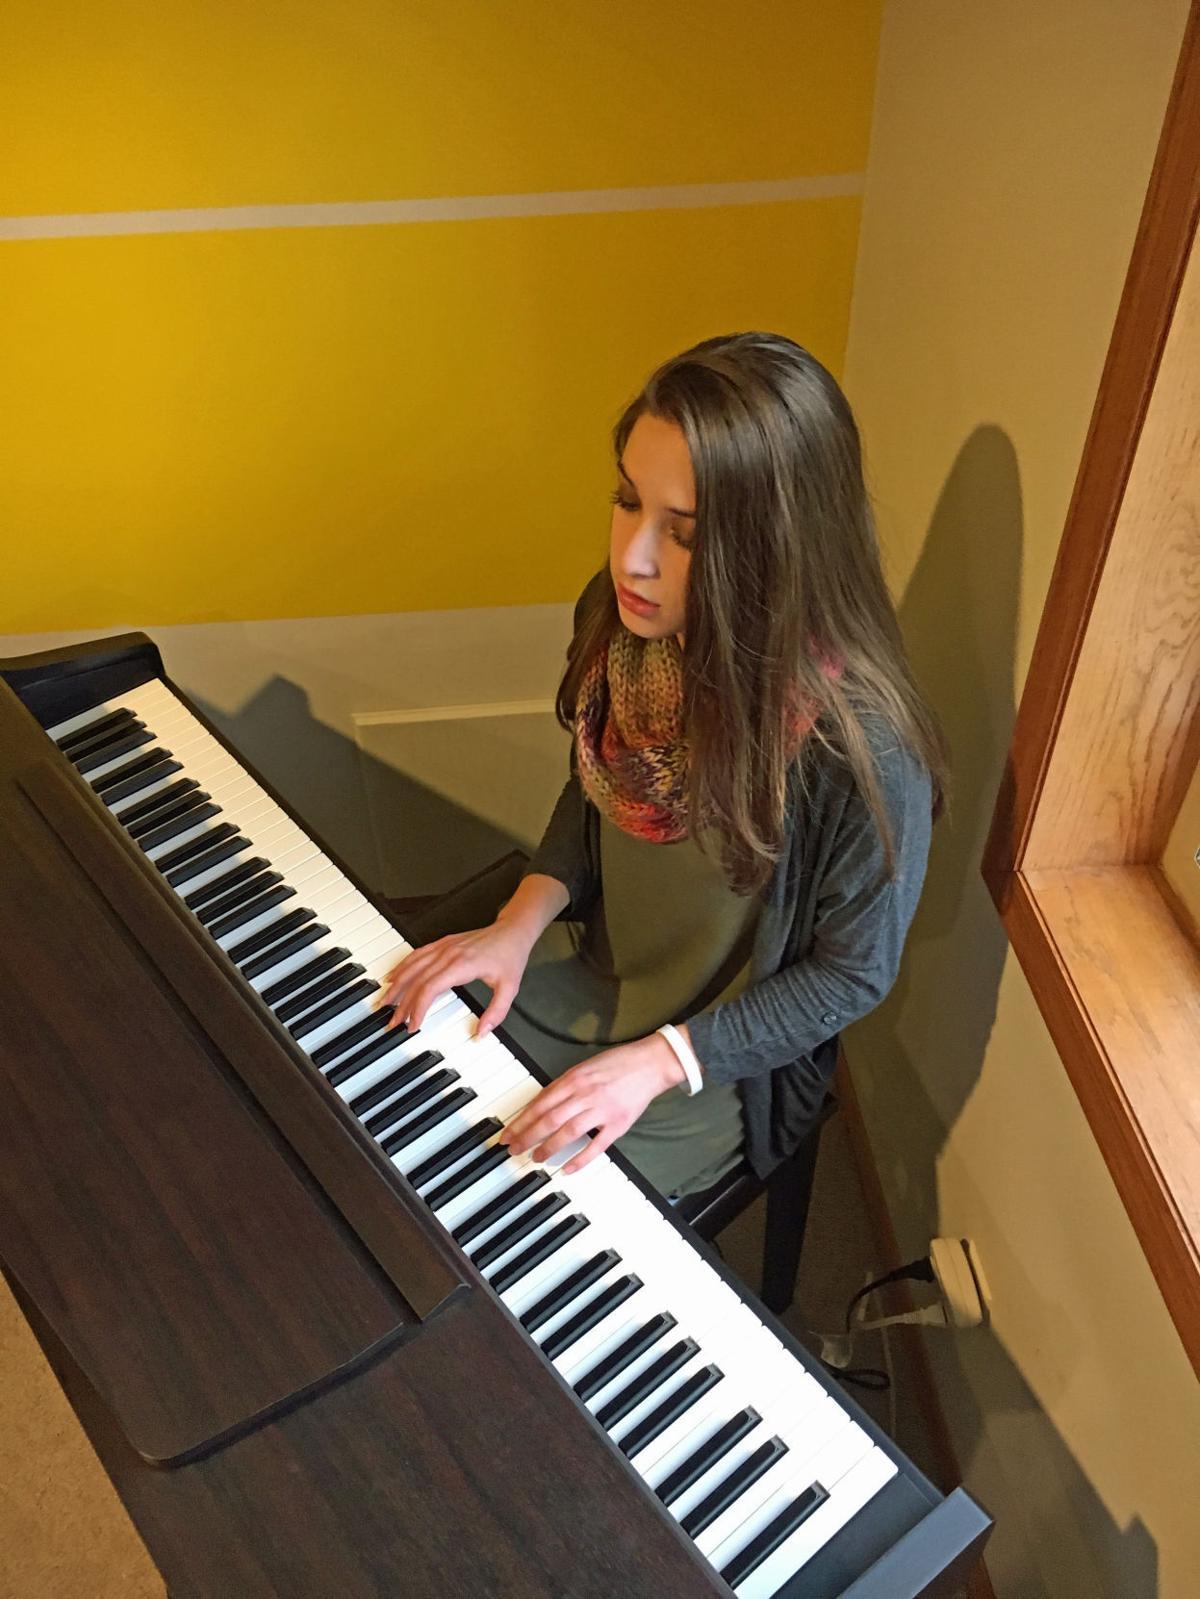 Super Star: Prior Lake High School student Gianna Bonello reaches for her dreams